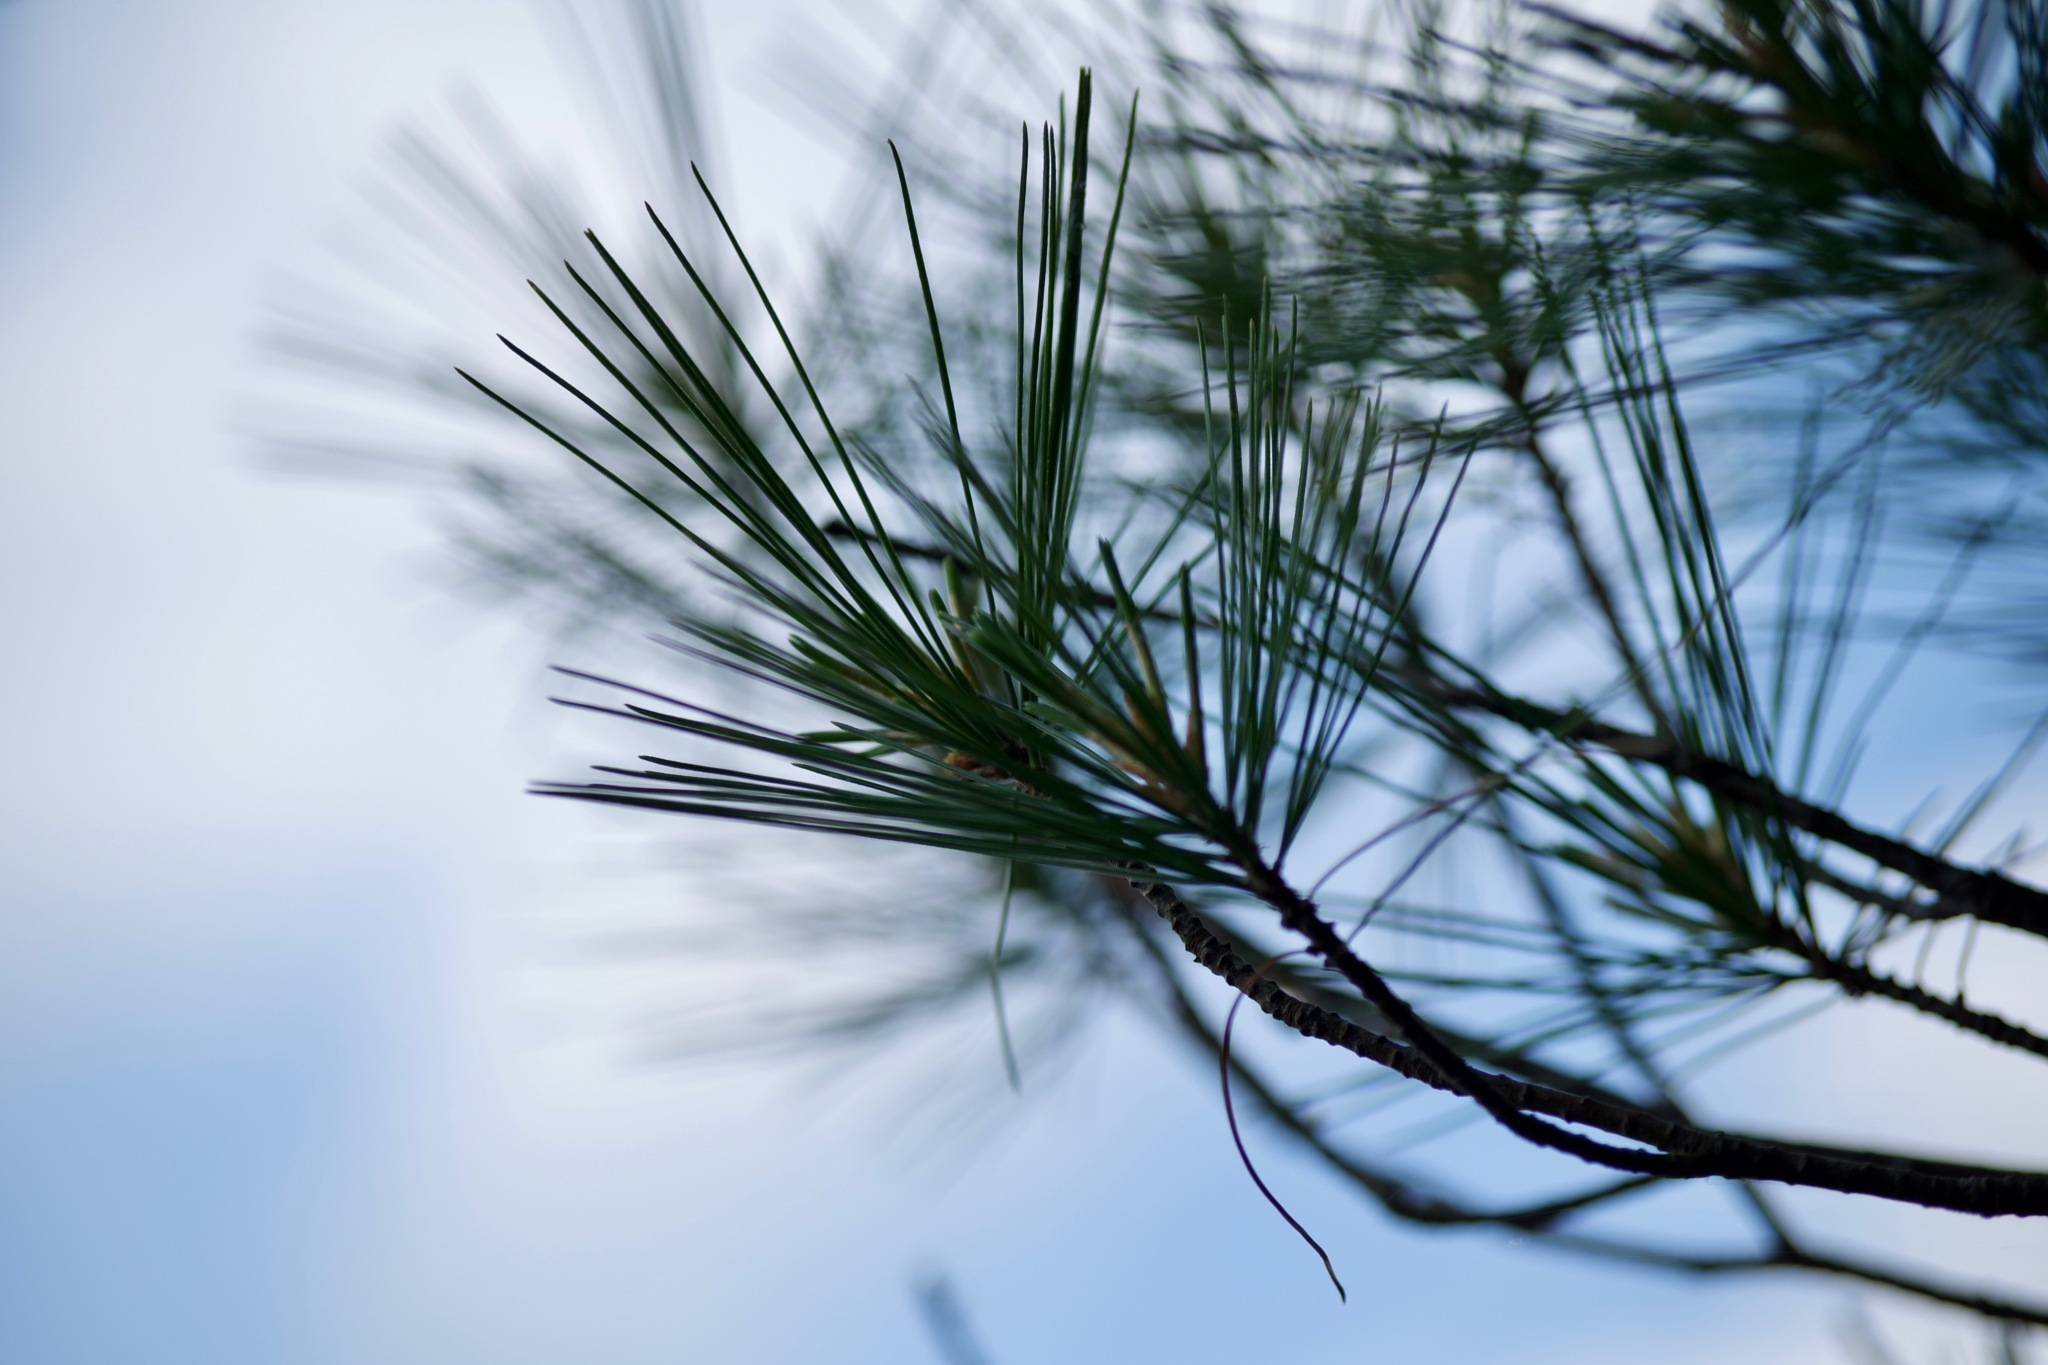 pine needles against sky by Virgilio de Carvalho